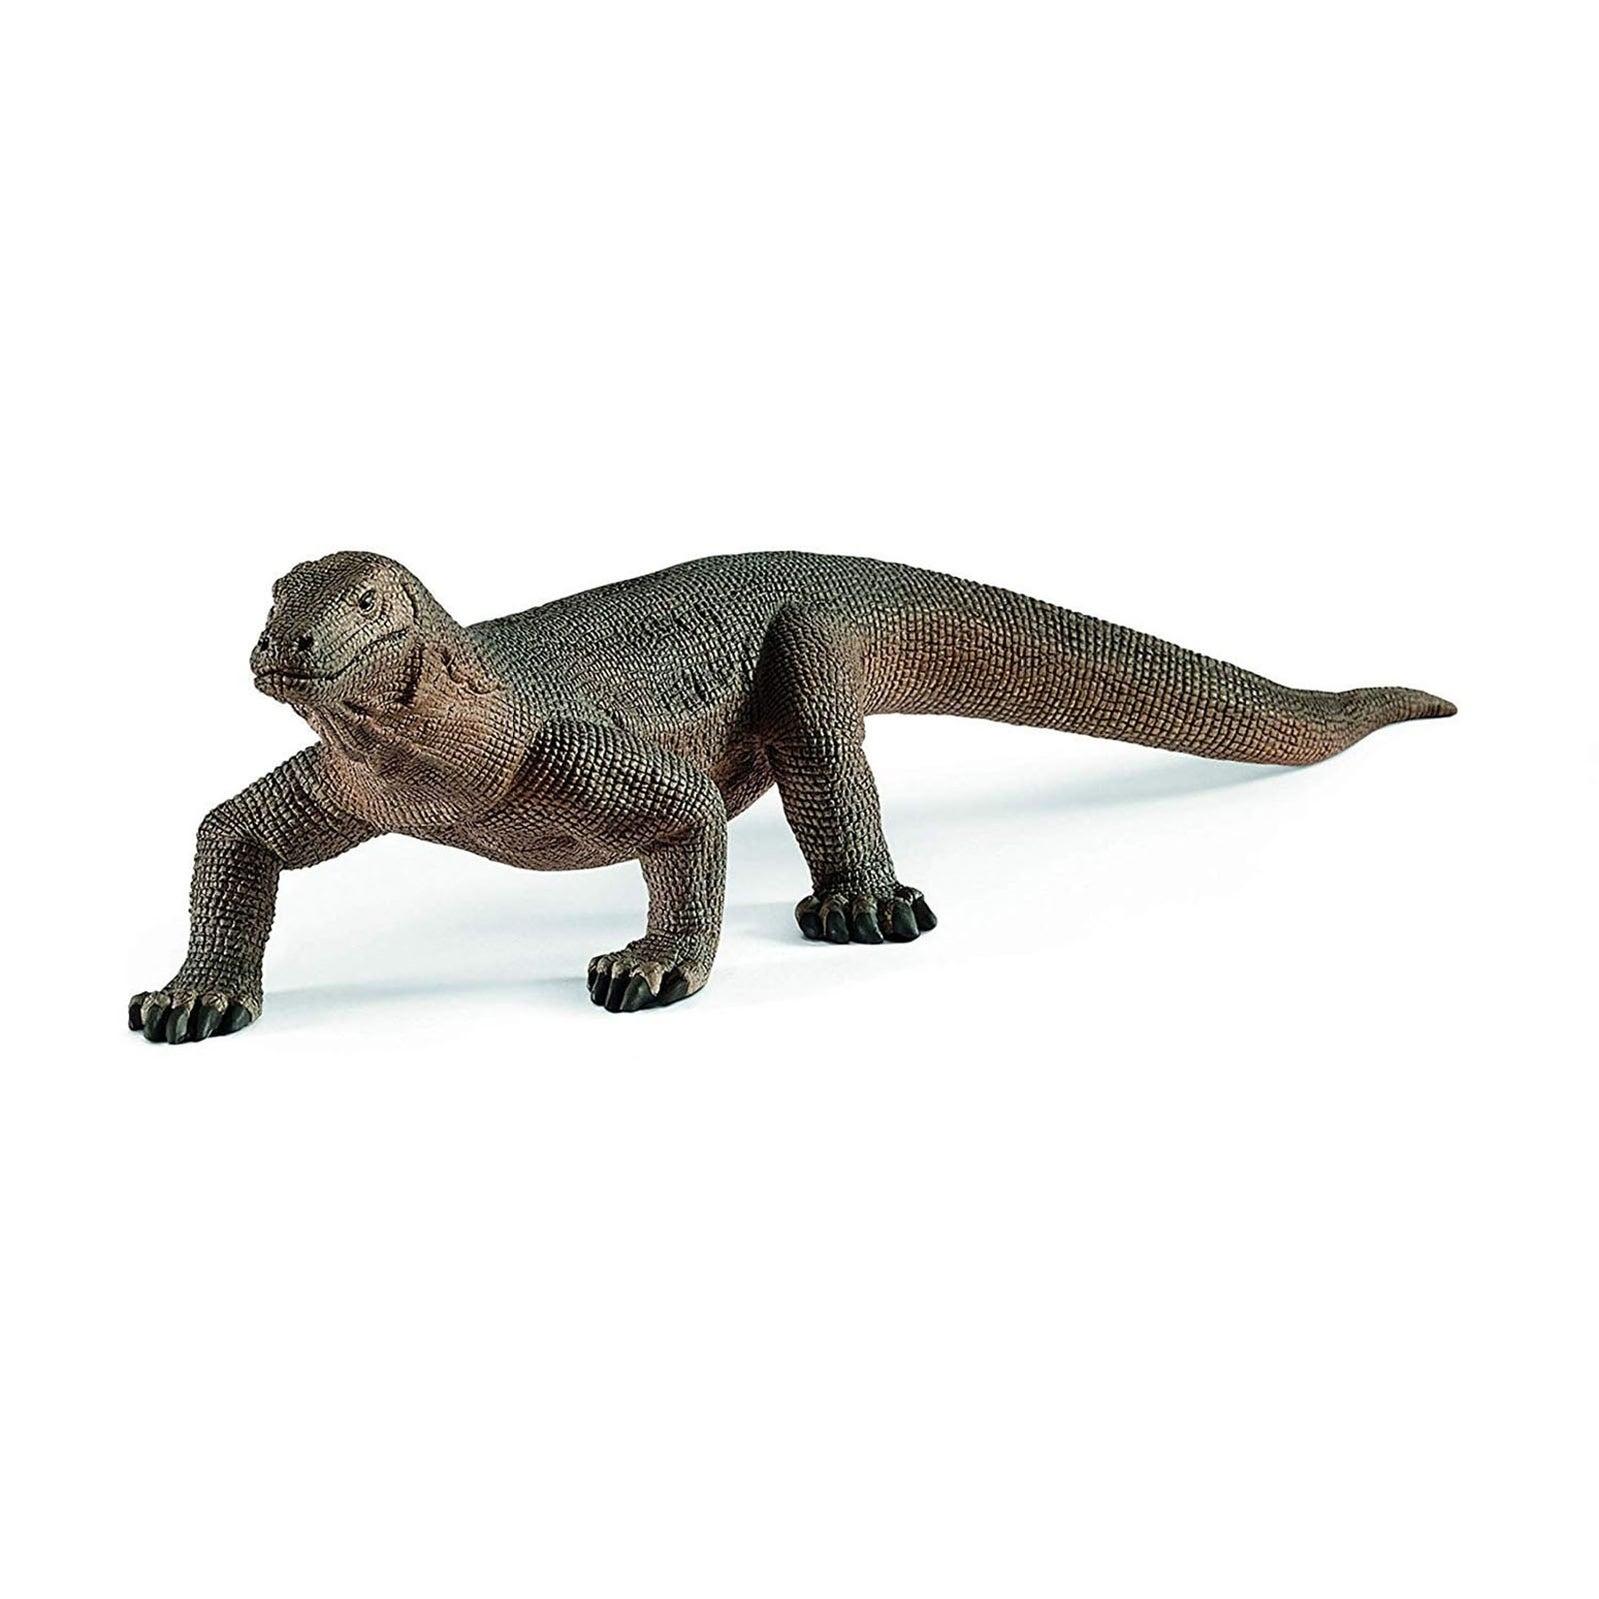 Schleich Wild Life Komodo Dragon Toy Animal Figure